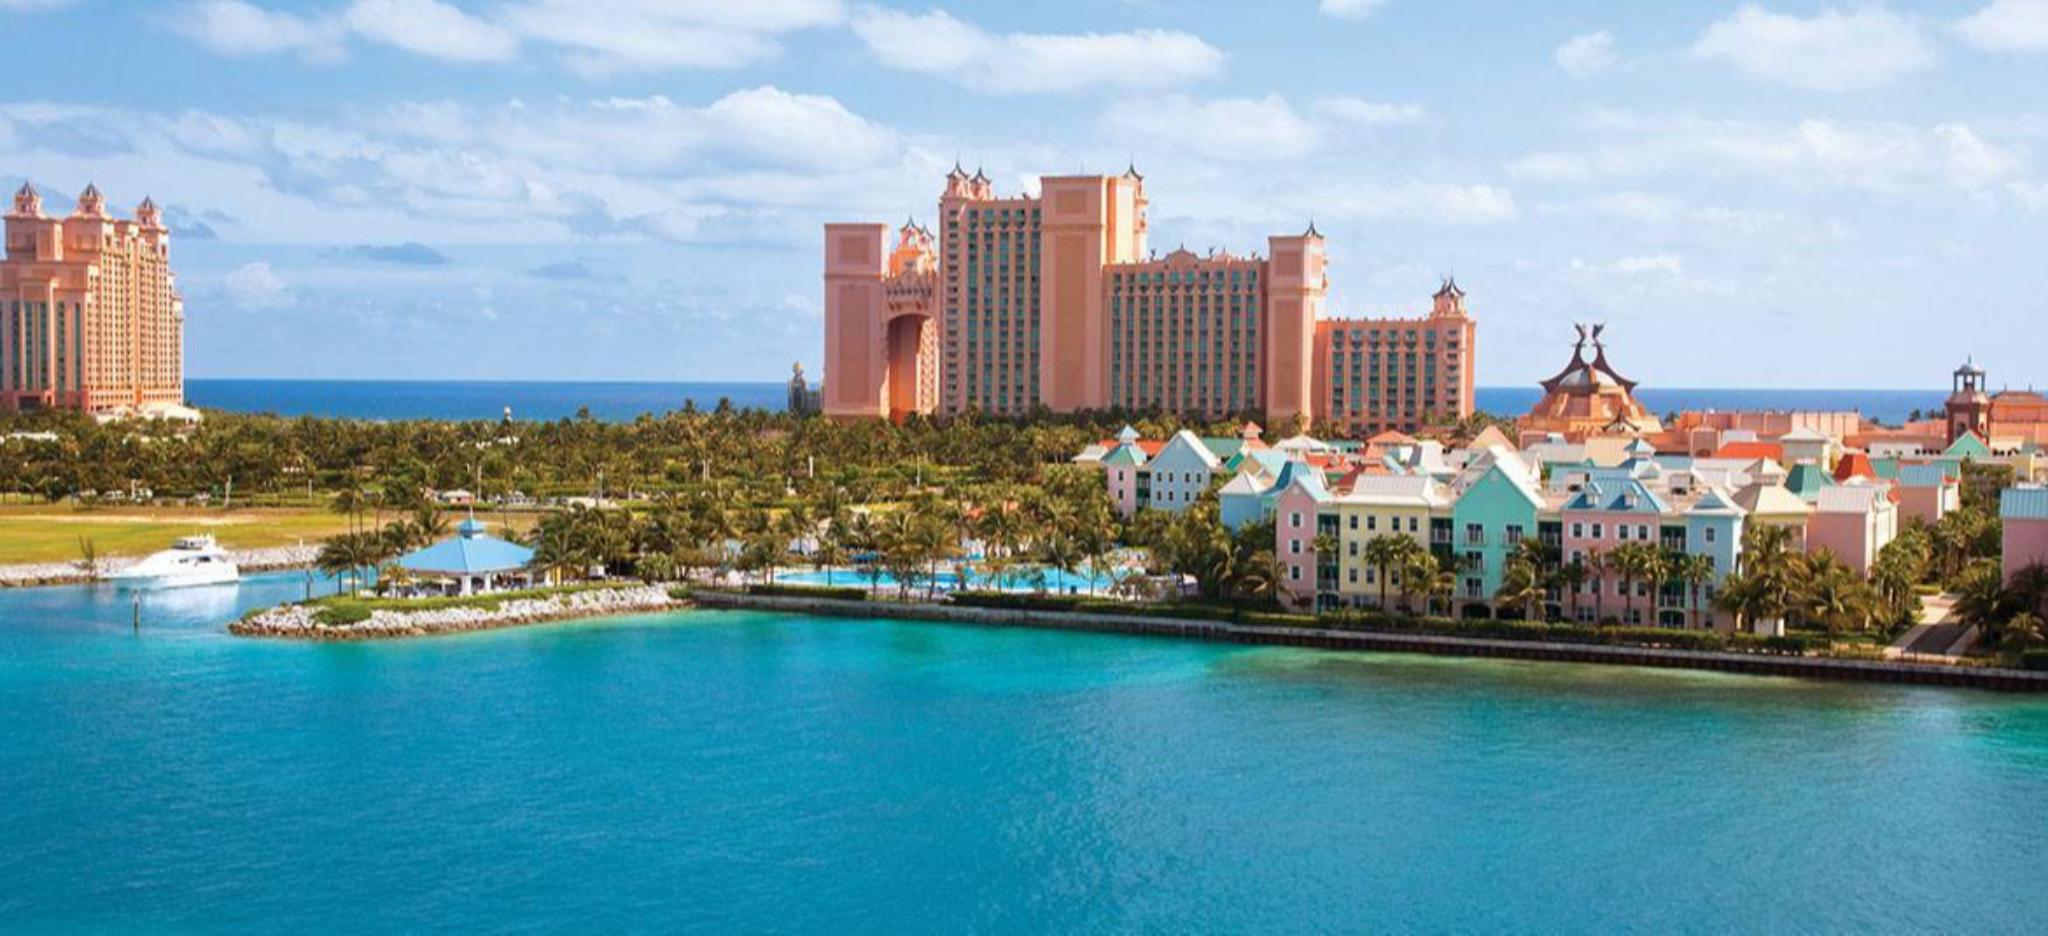 Harborside Resort Nassau, Bahamas